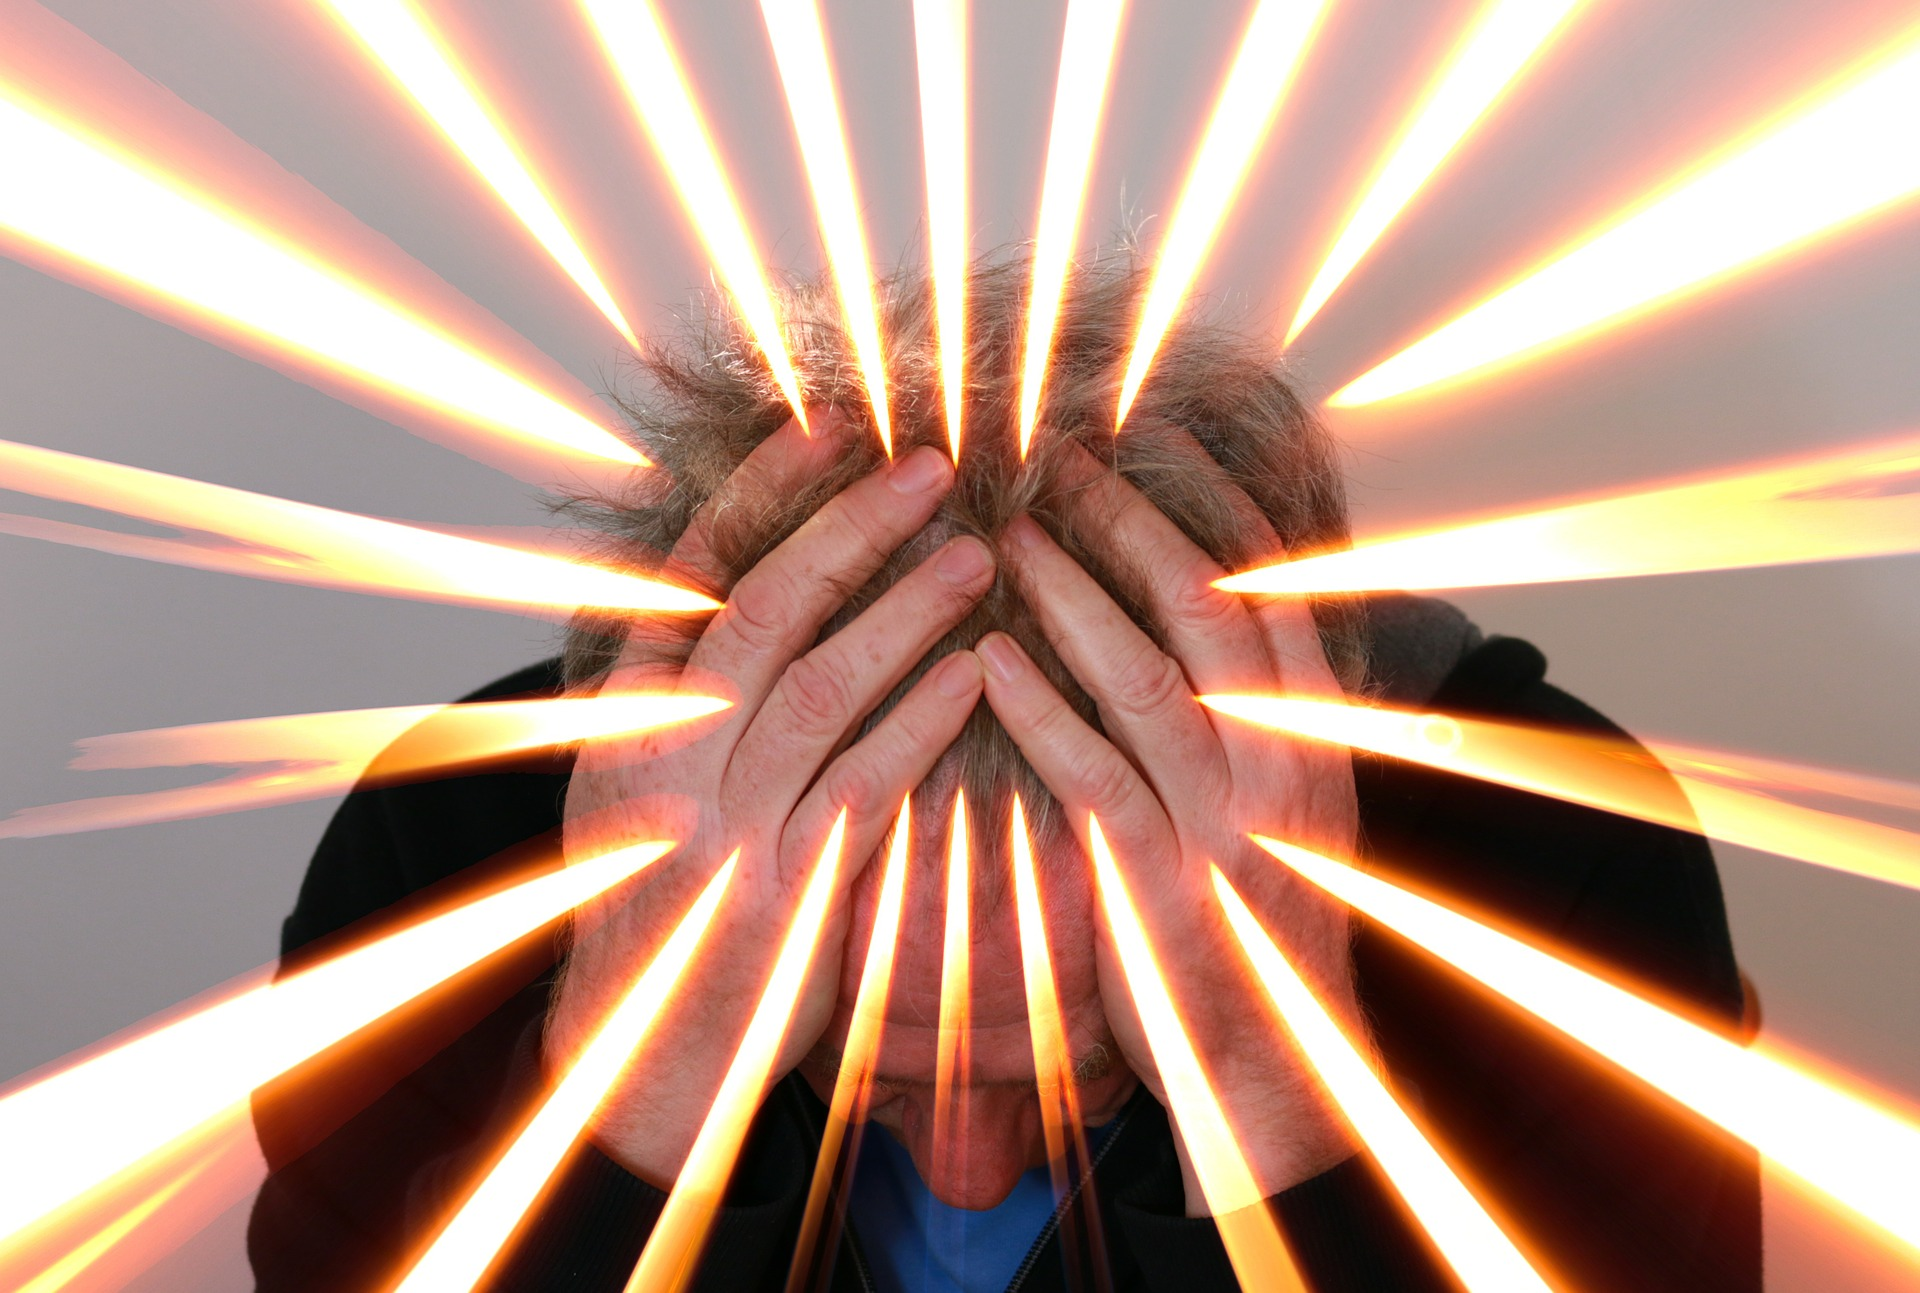 Sphenoid Sinusitis Headache Symptoms vs. Aneurysm Headache